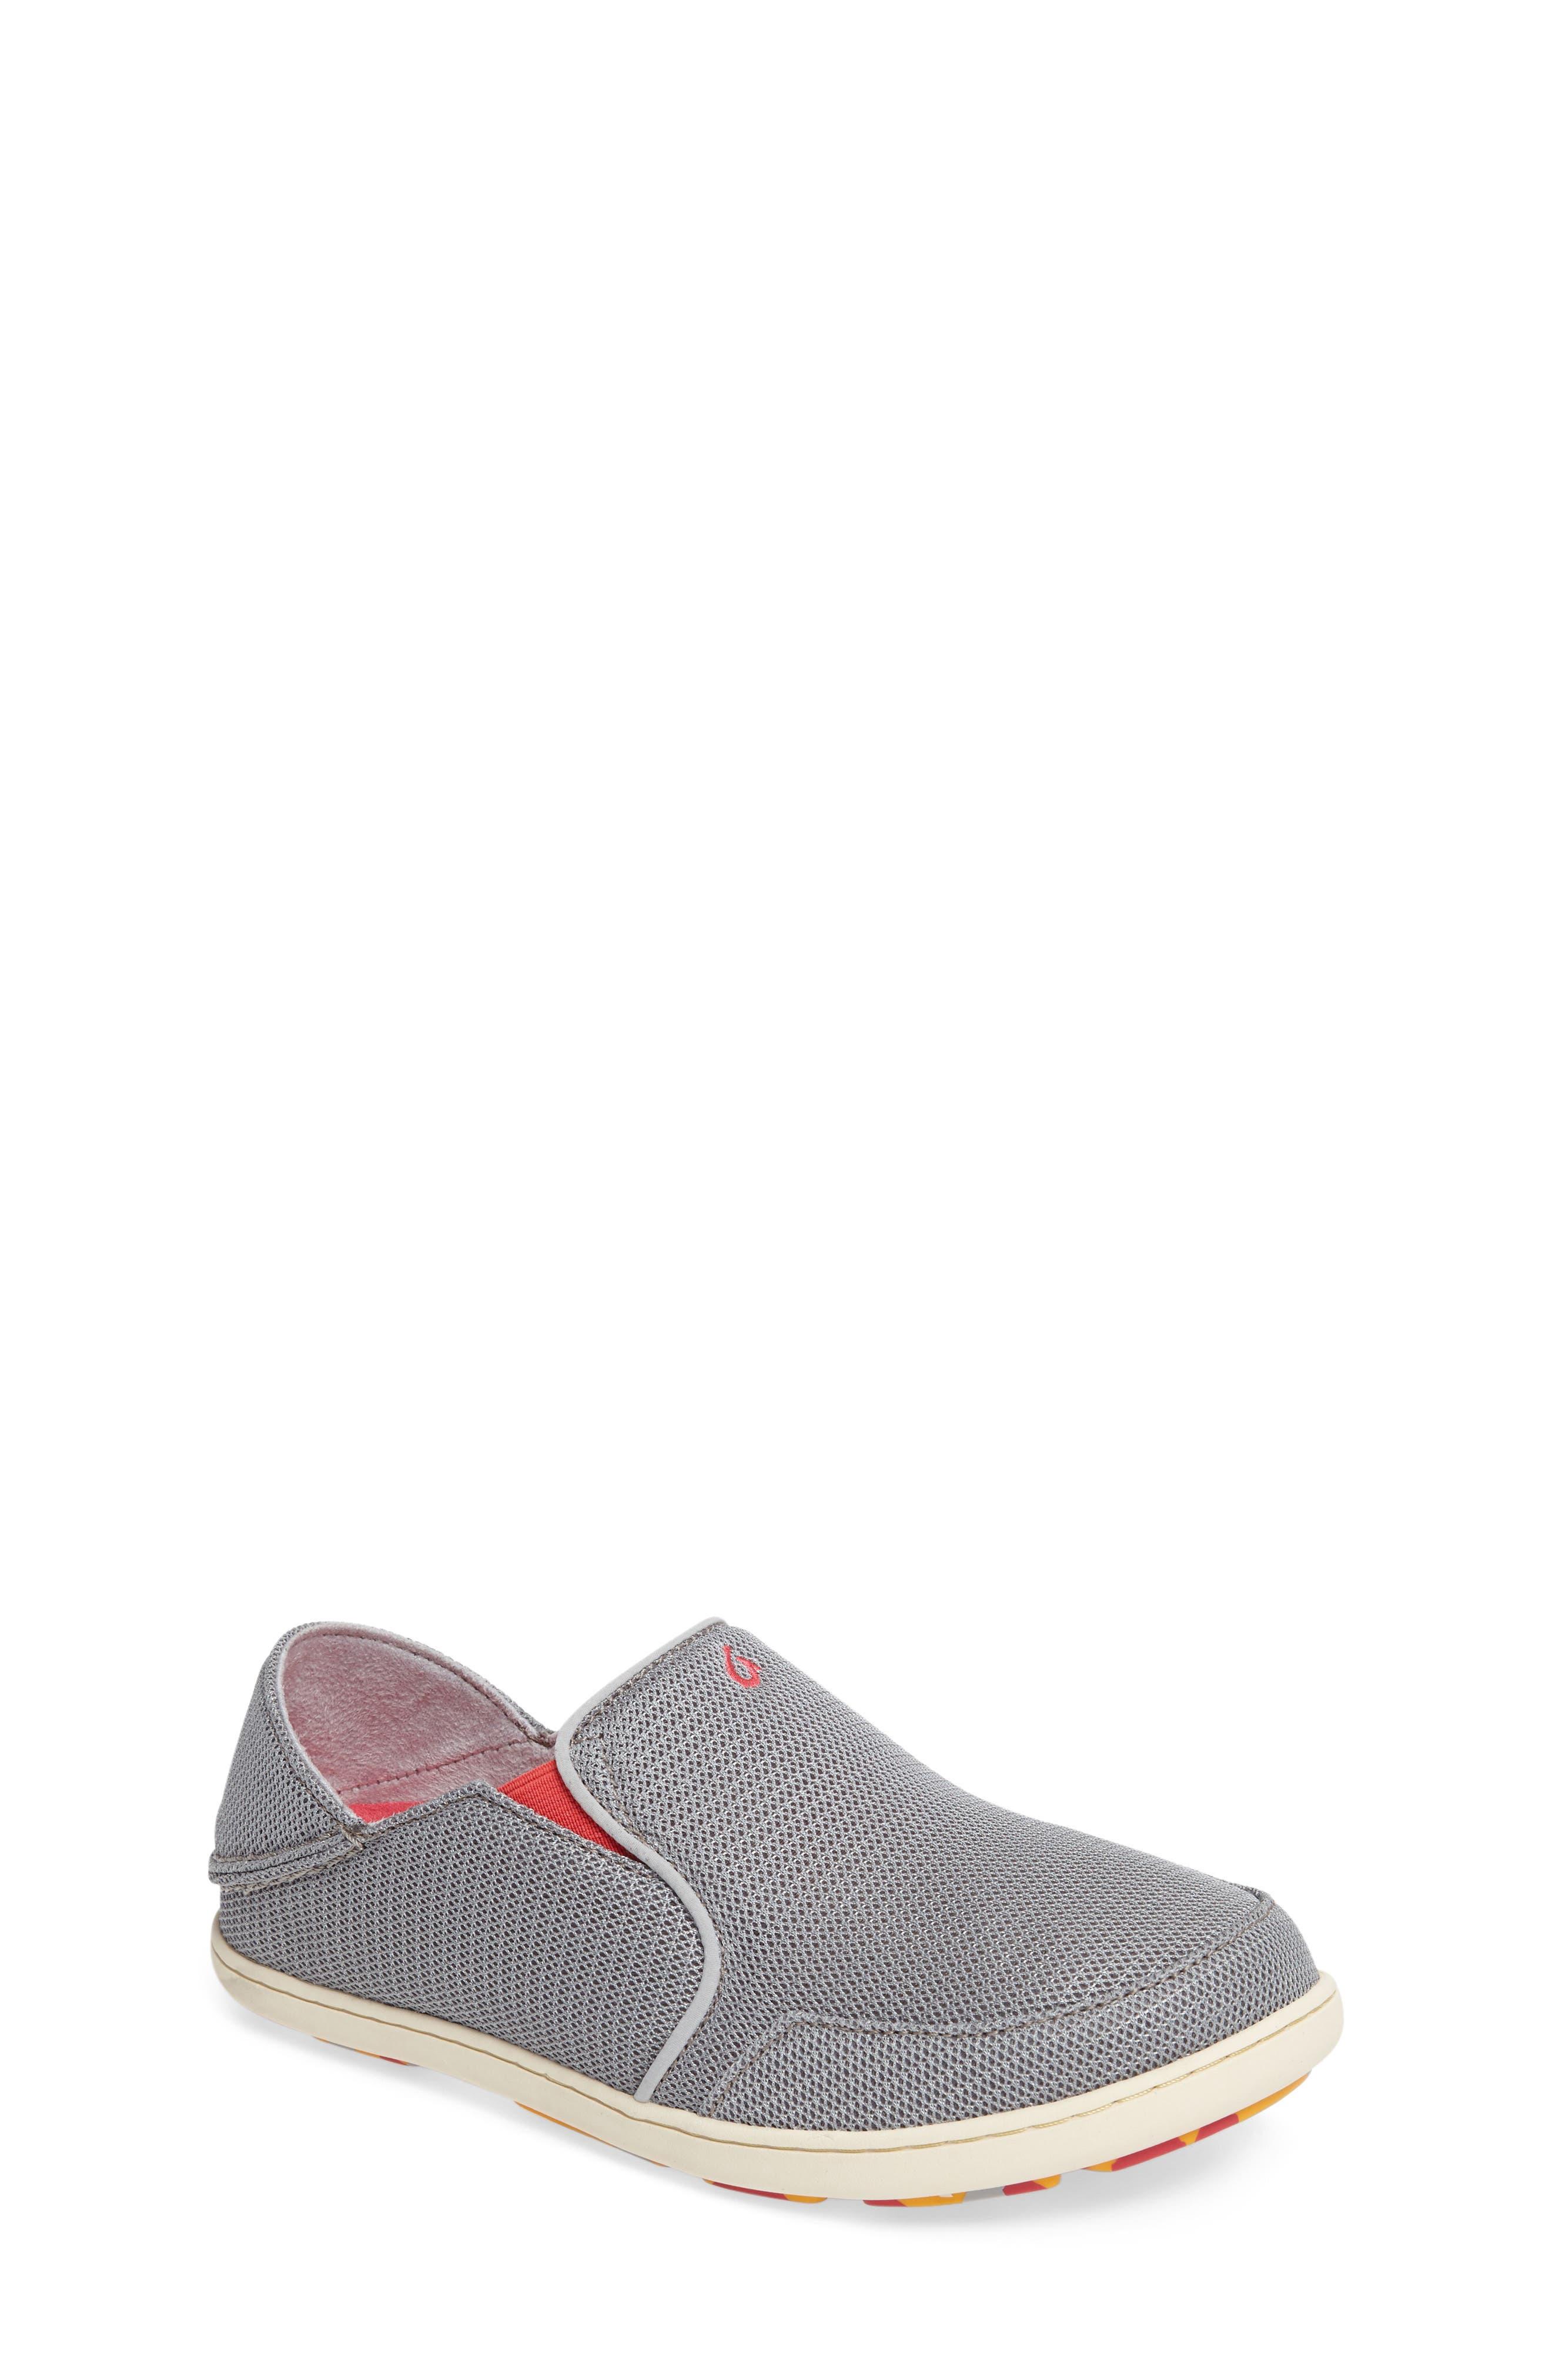 'Nohea' Mesh Shoe,                         Main,                         color, PALE GREY/ DARK HIBISCUS